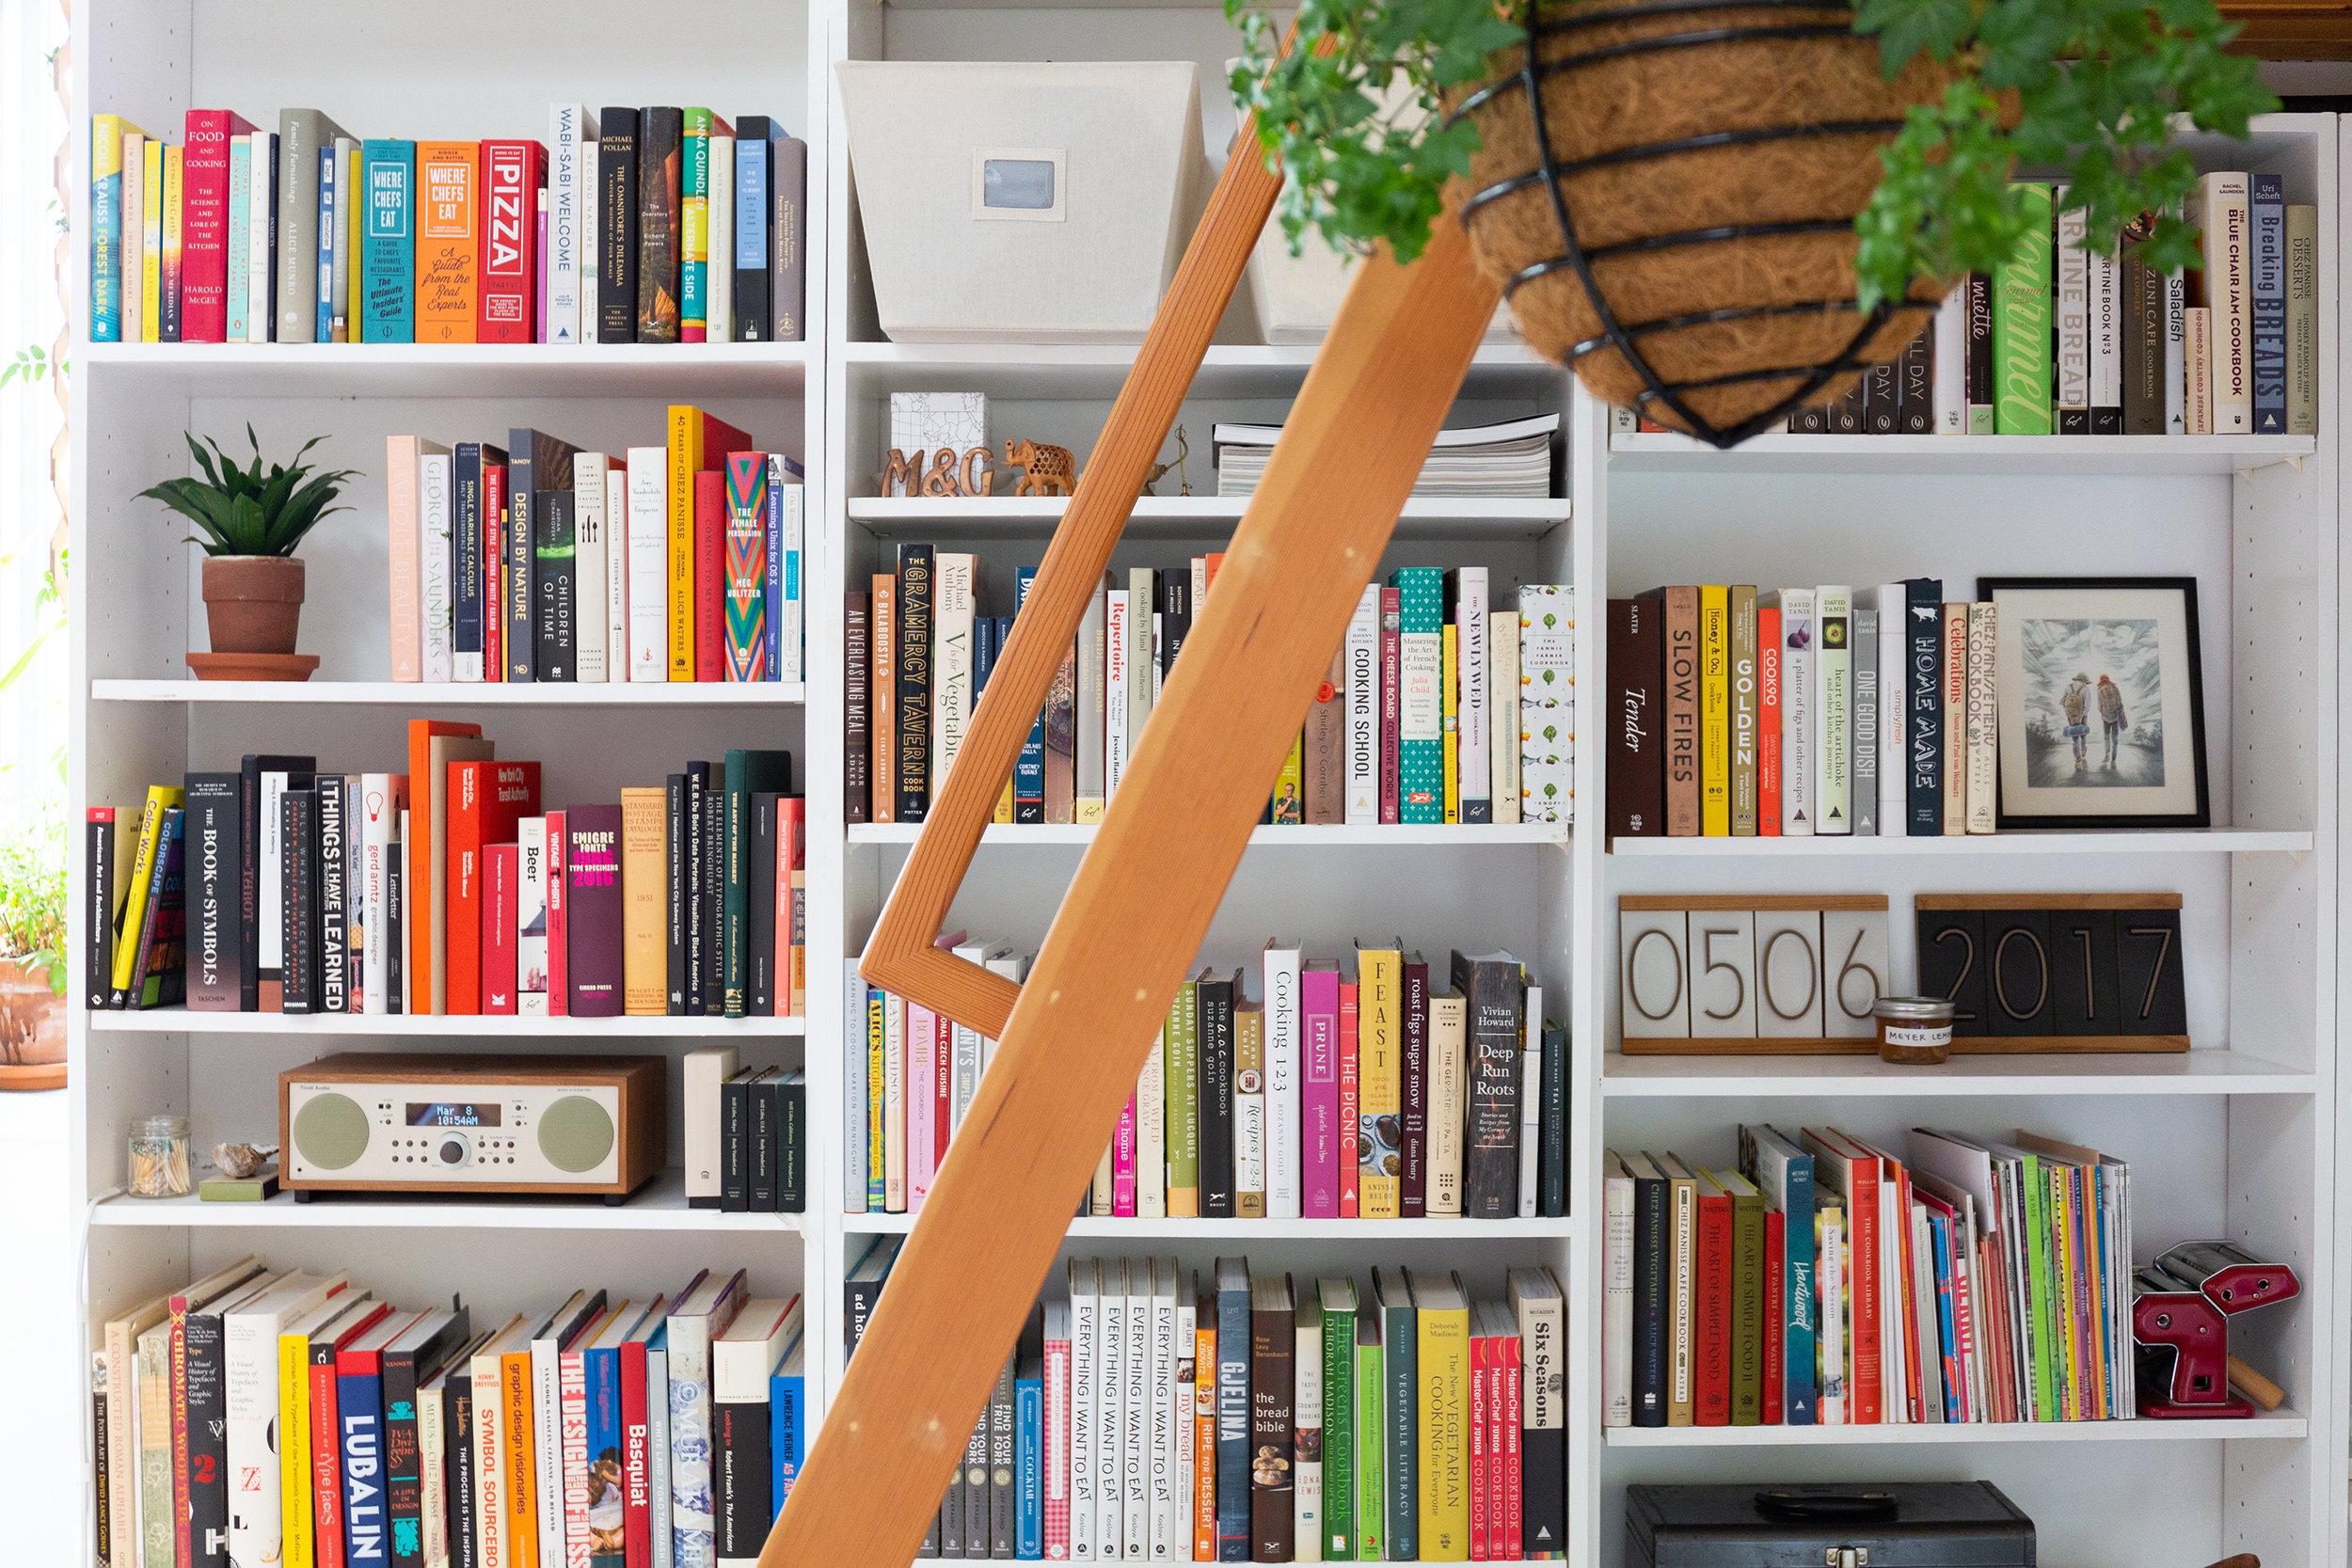 cookbook-collection-bookshelves.jpg